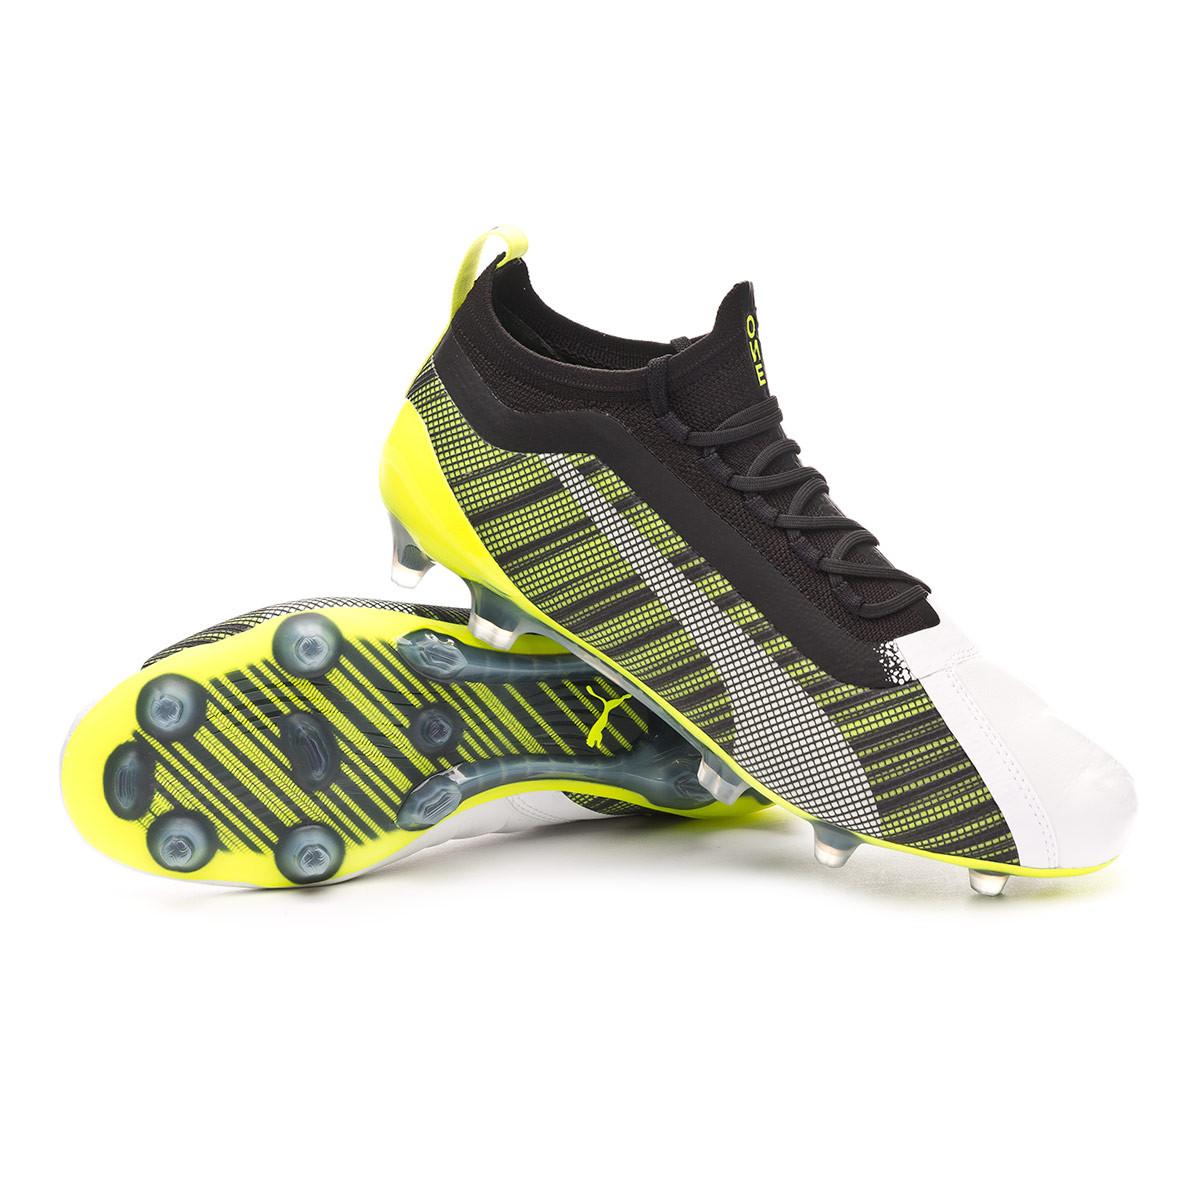 Puma One 5.1 FG/AG Football Boots